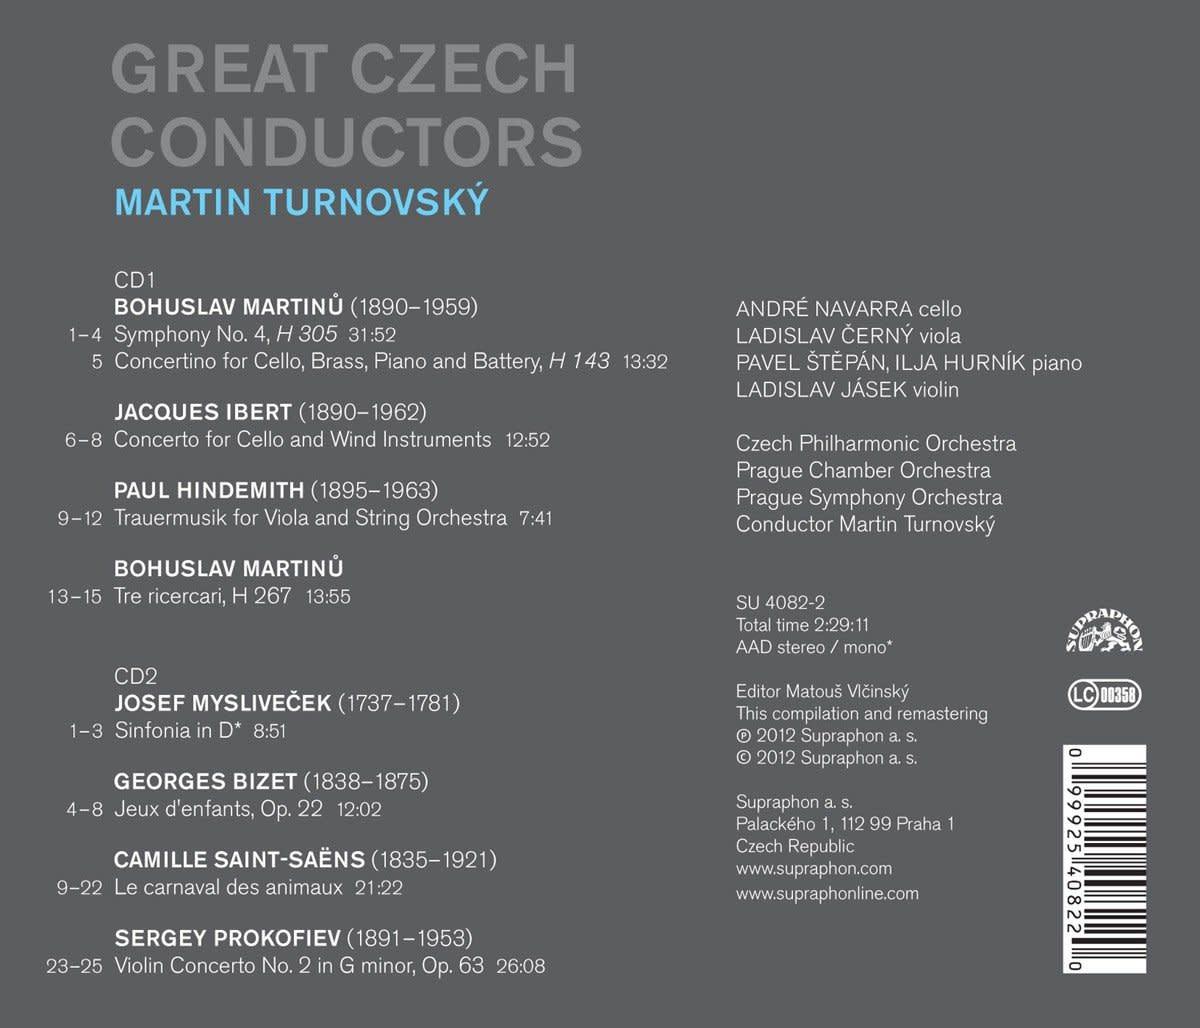 Photo No.2 of Great Czech Conductors: Martin Turnovský